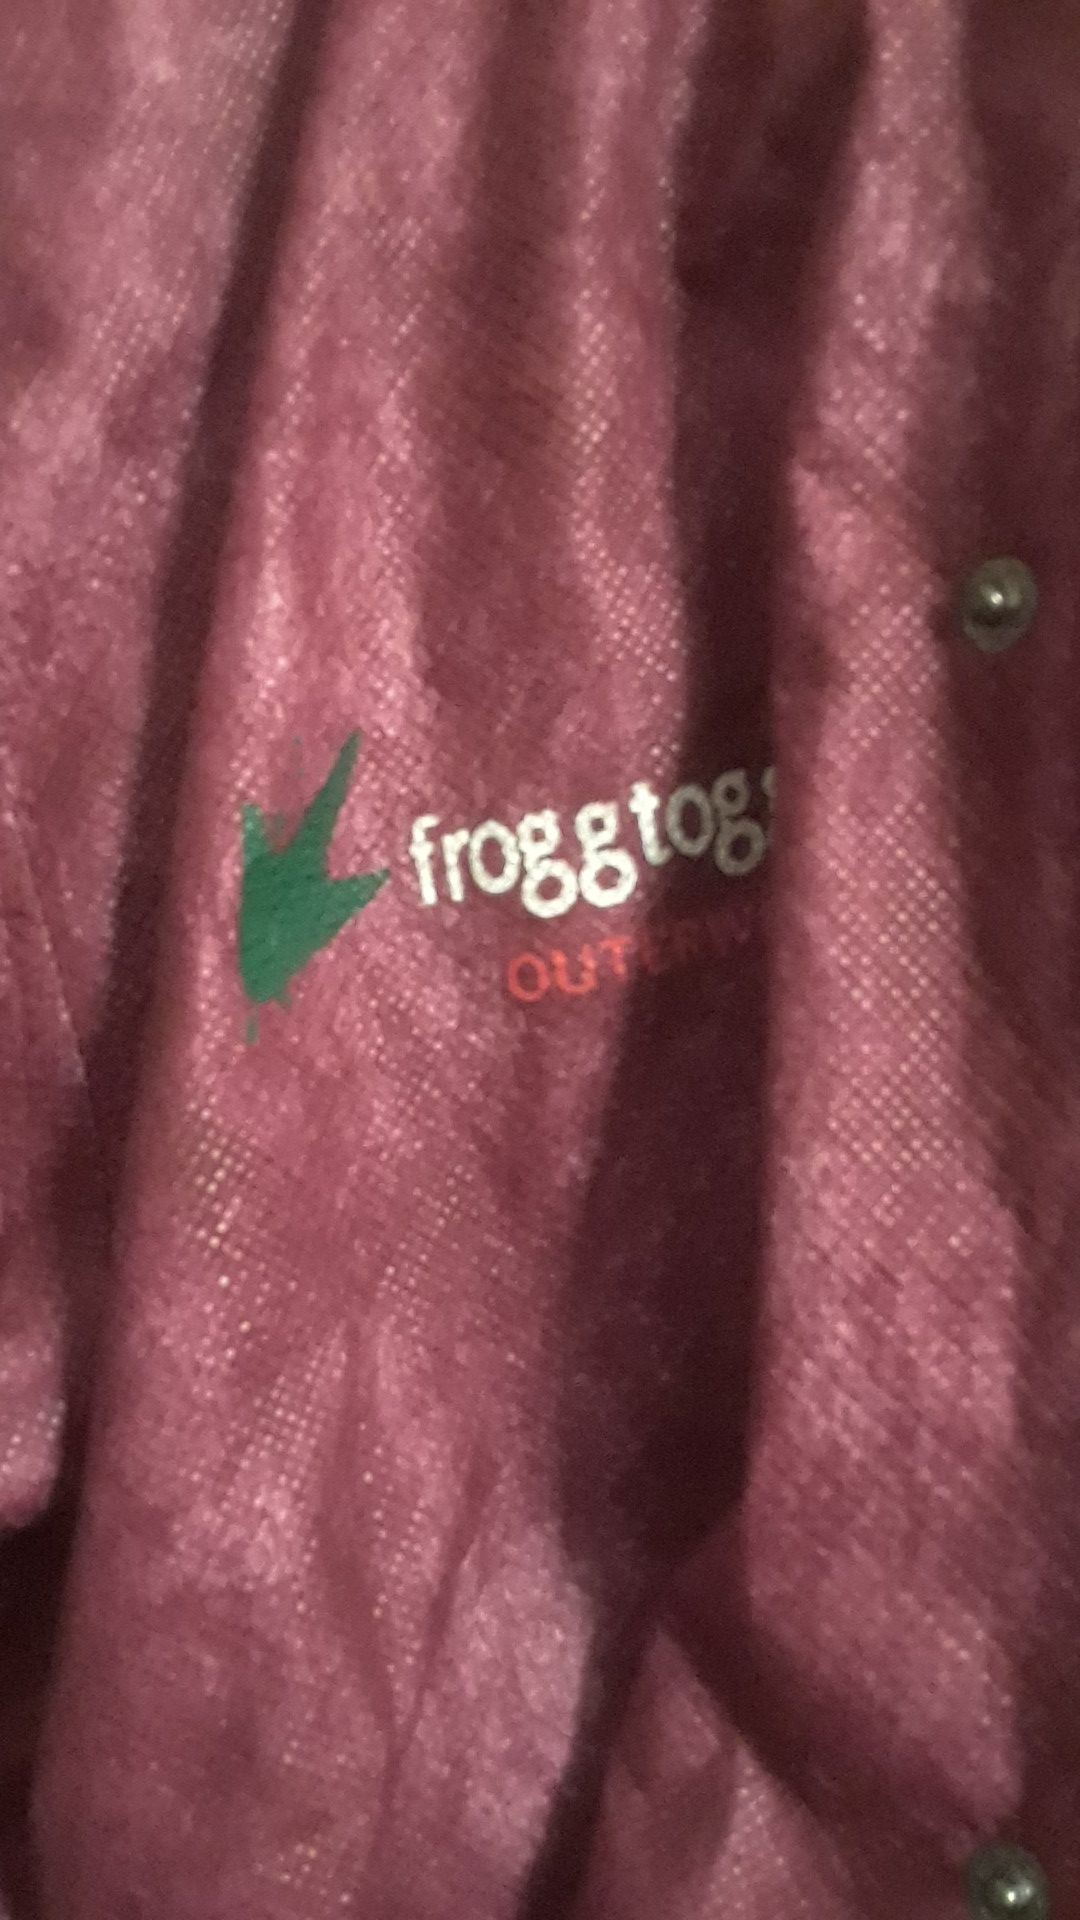 NWOT FroggToggs ladies rain suit sz small